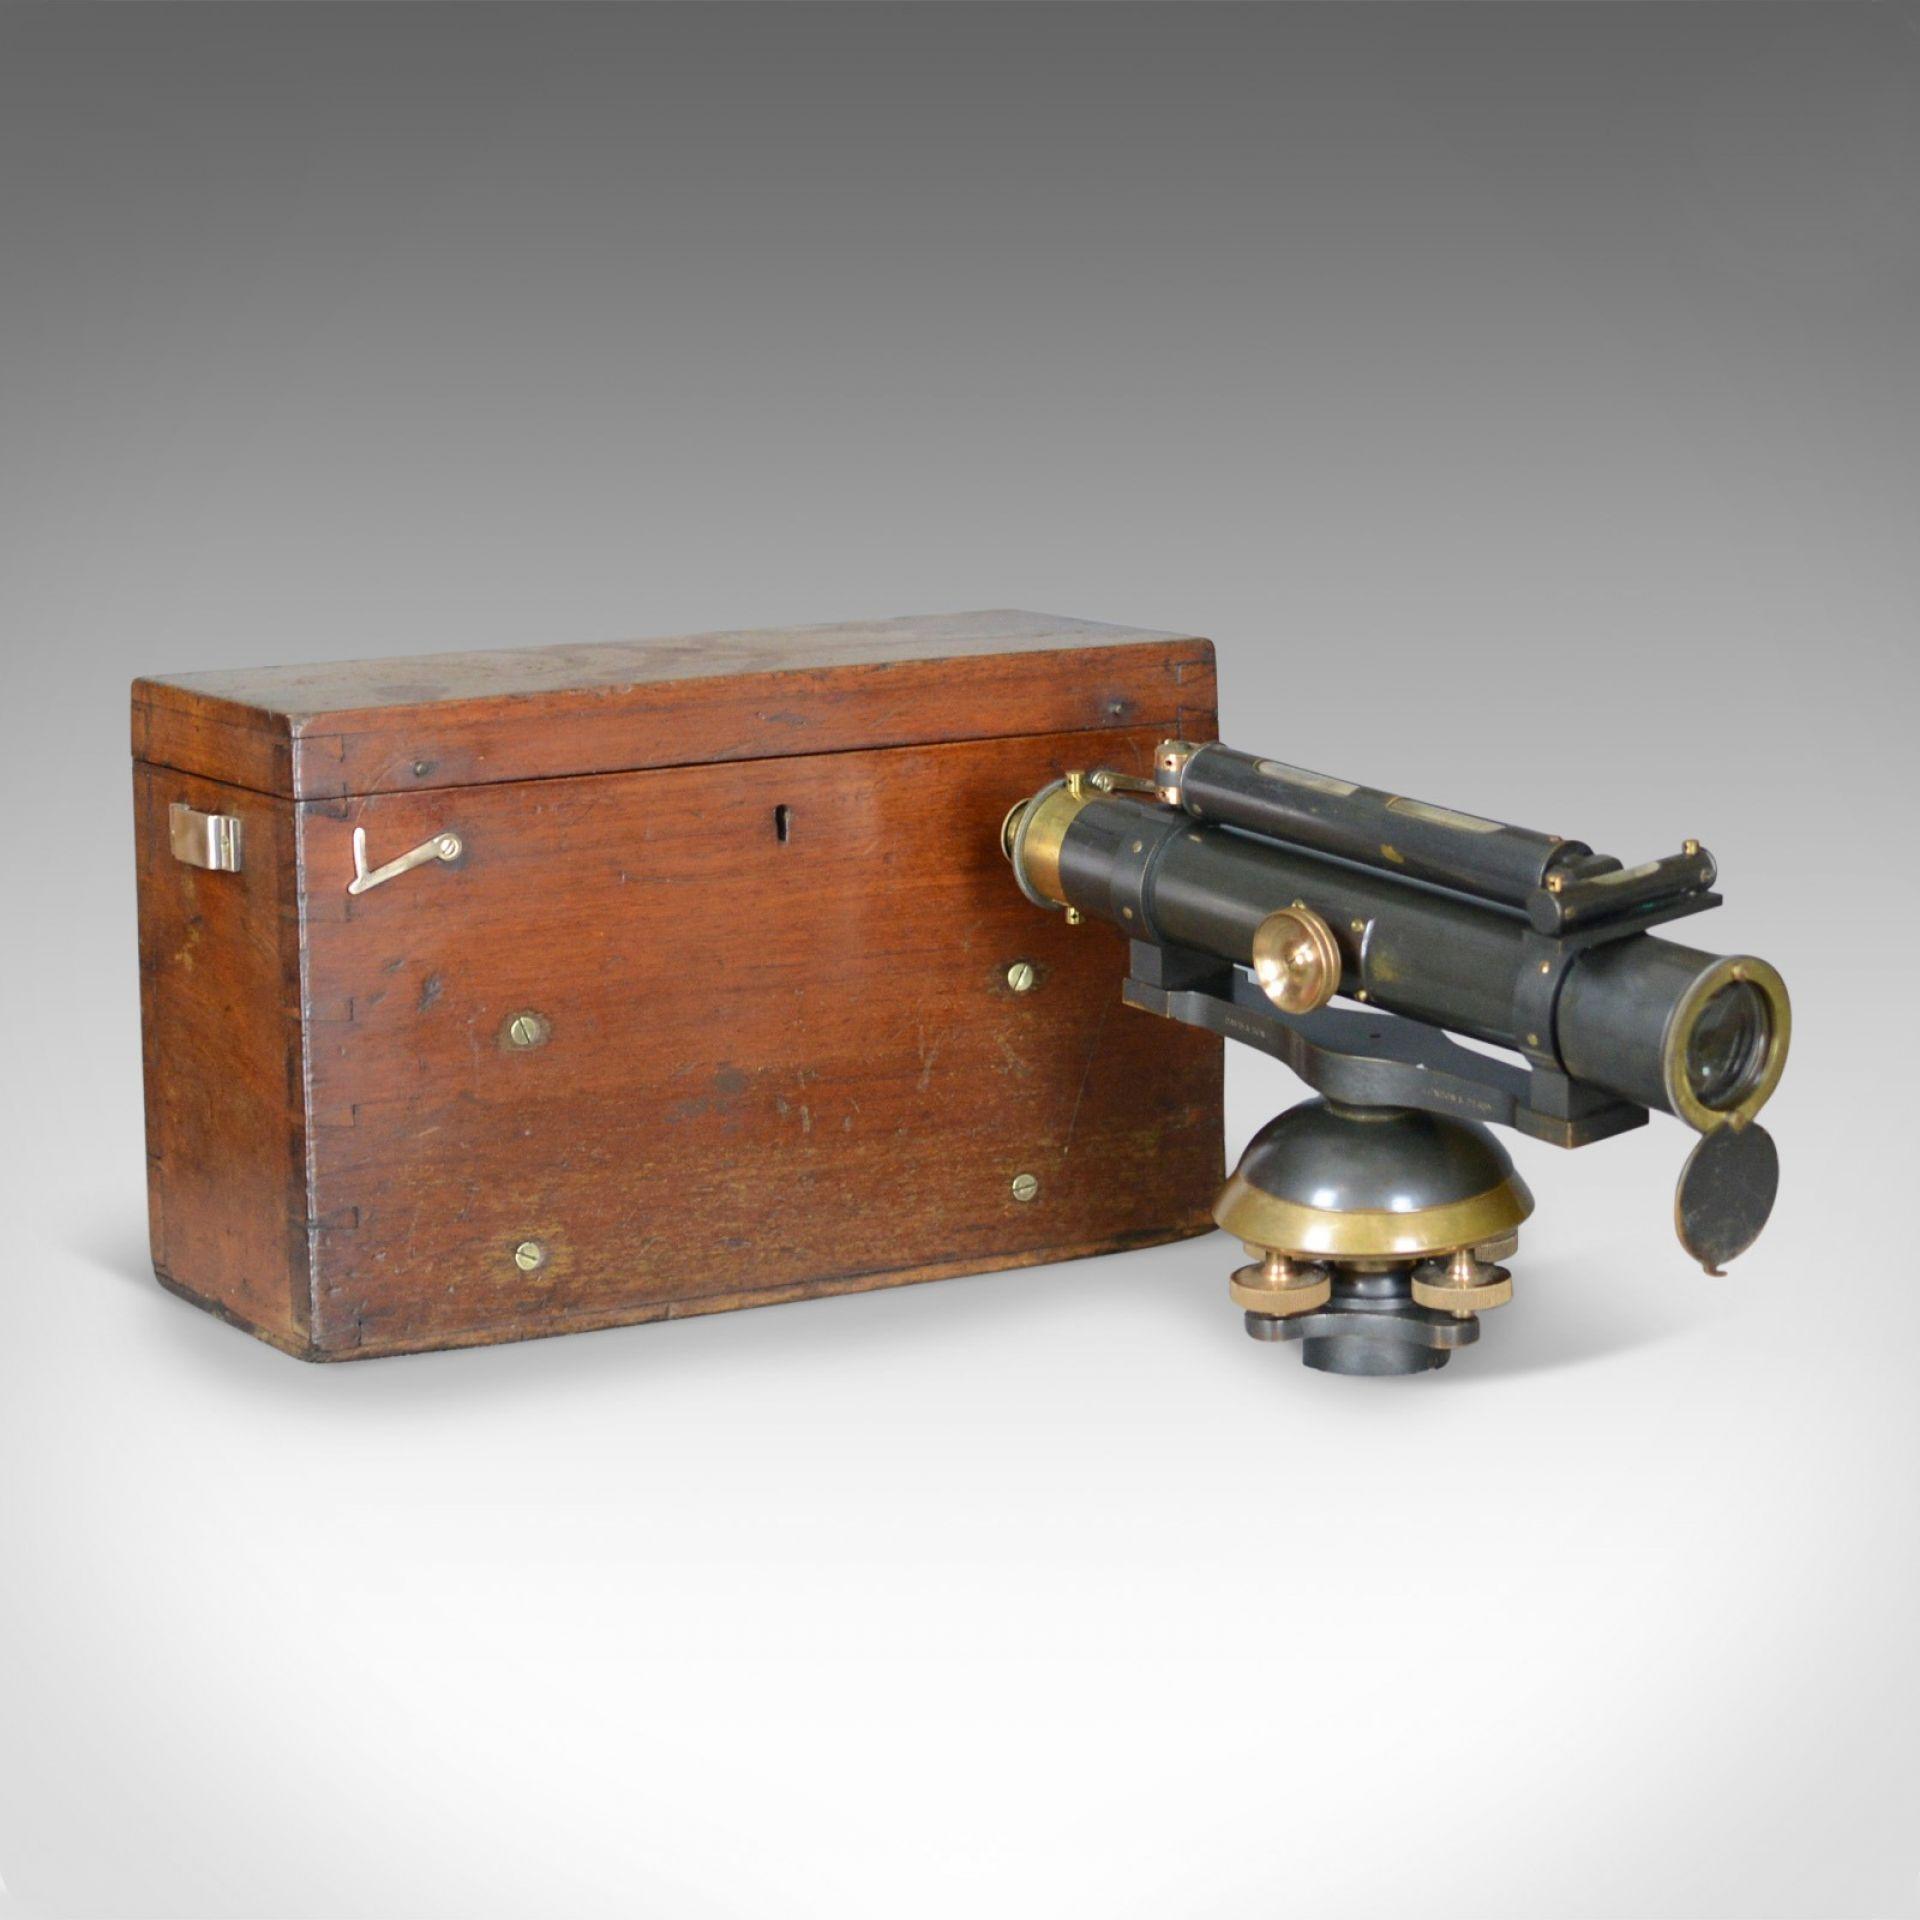 Vintage Surveyors Level in Case, Scientific Instrument, John Davis and Son c1940